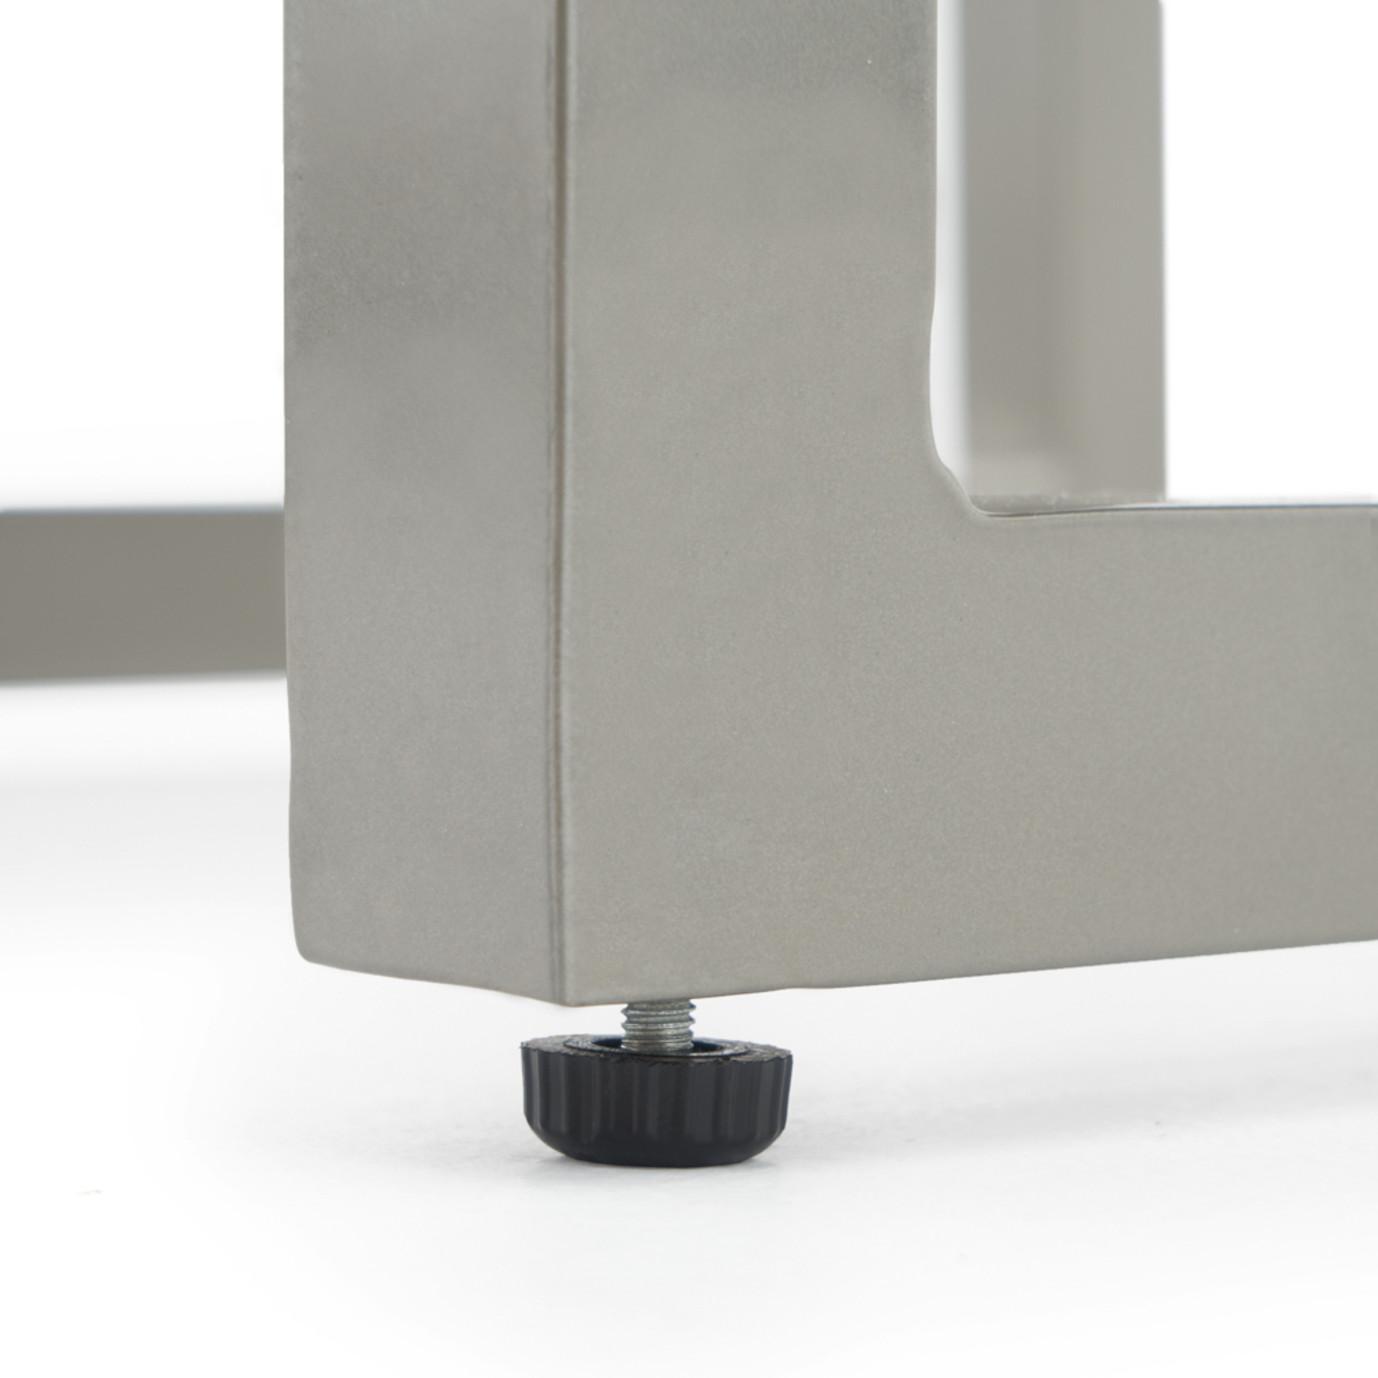 Milo™ Espresso 7pc Motion Deep Seating Set - Charcoal Grey